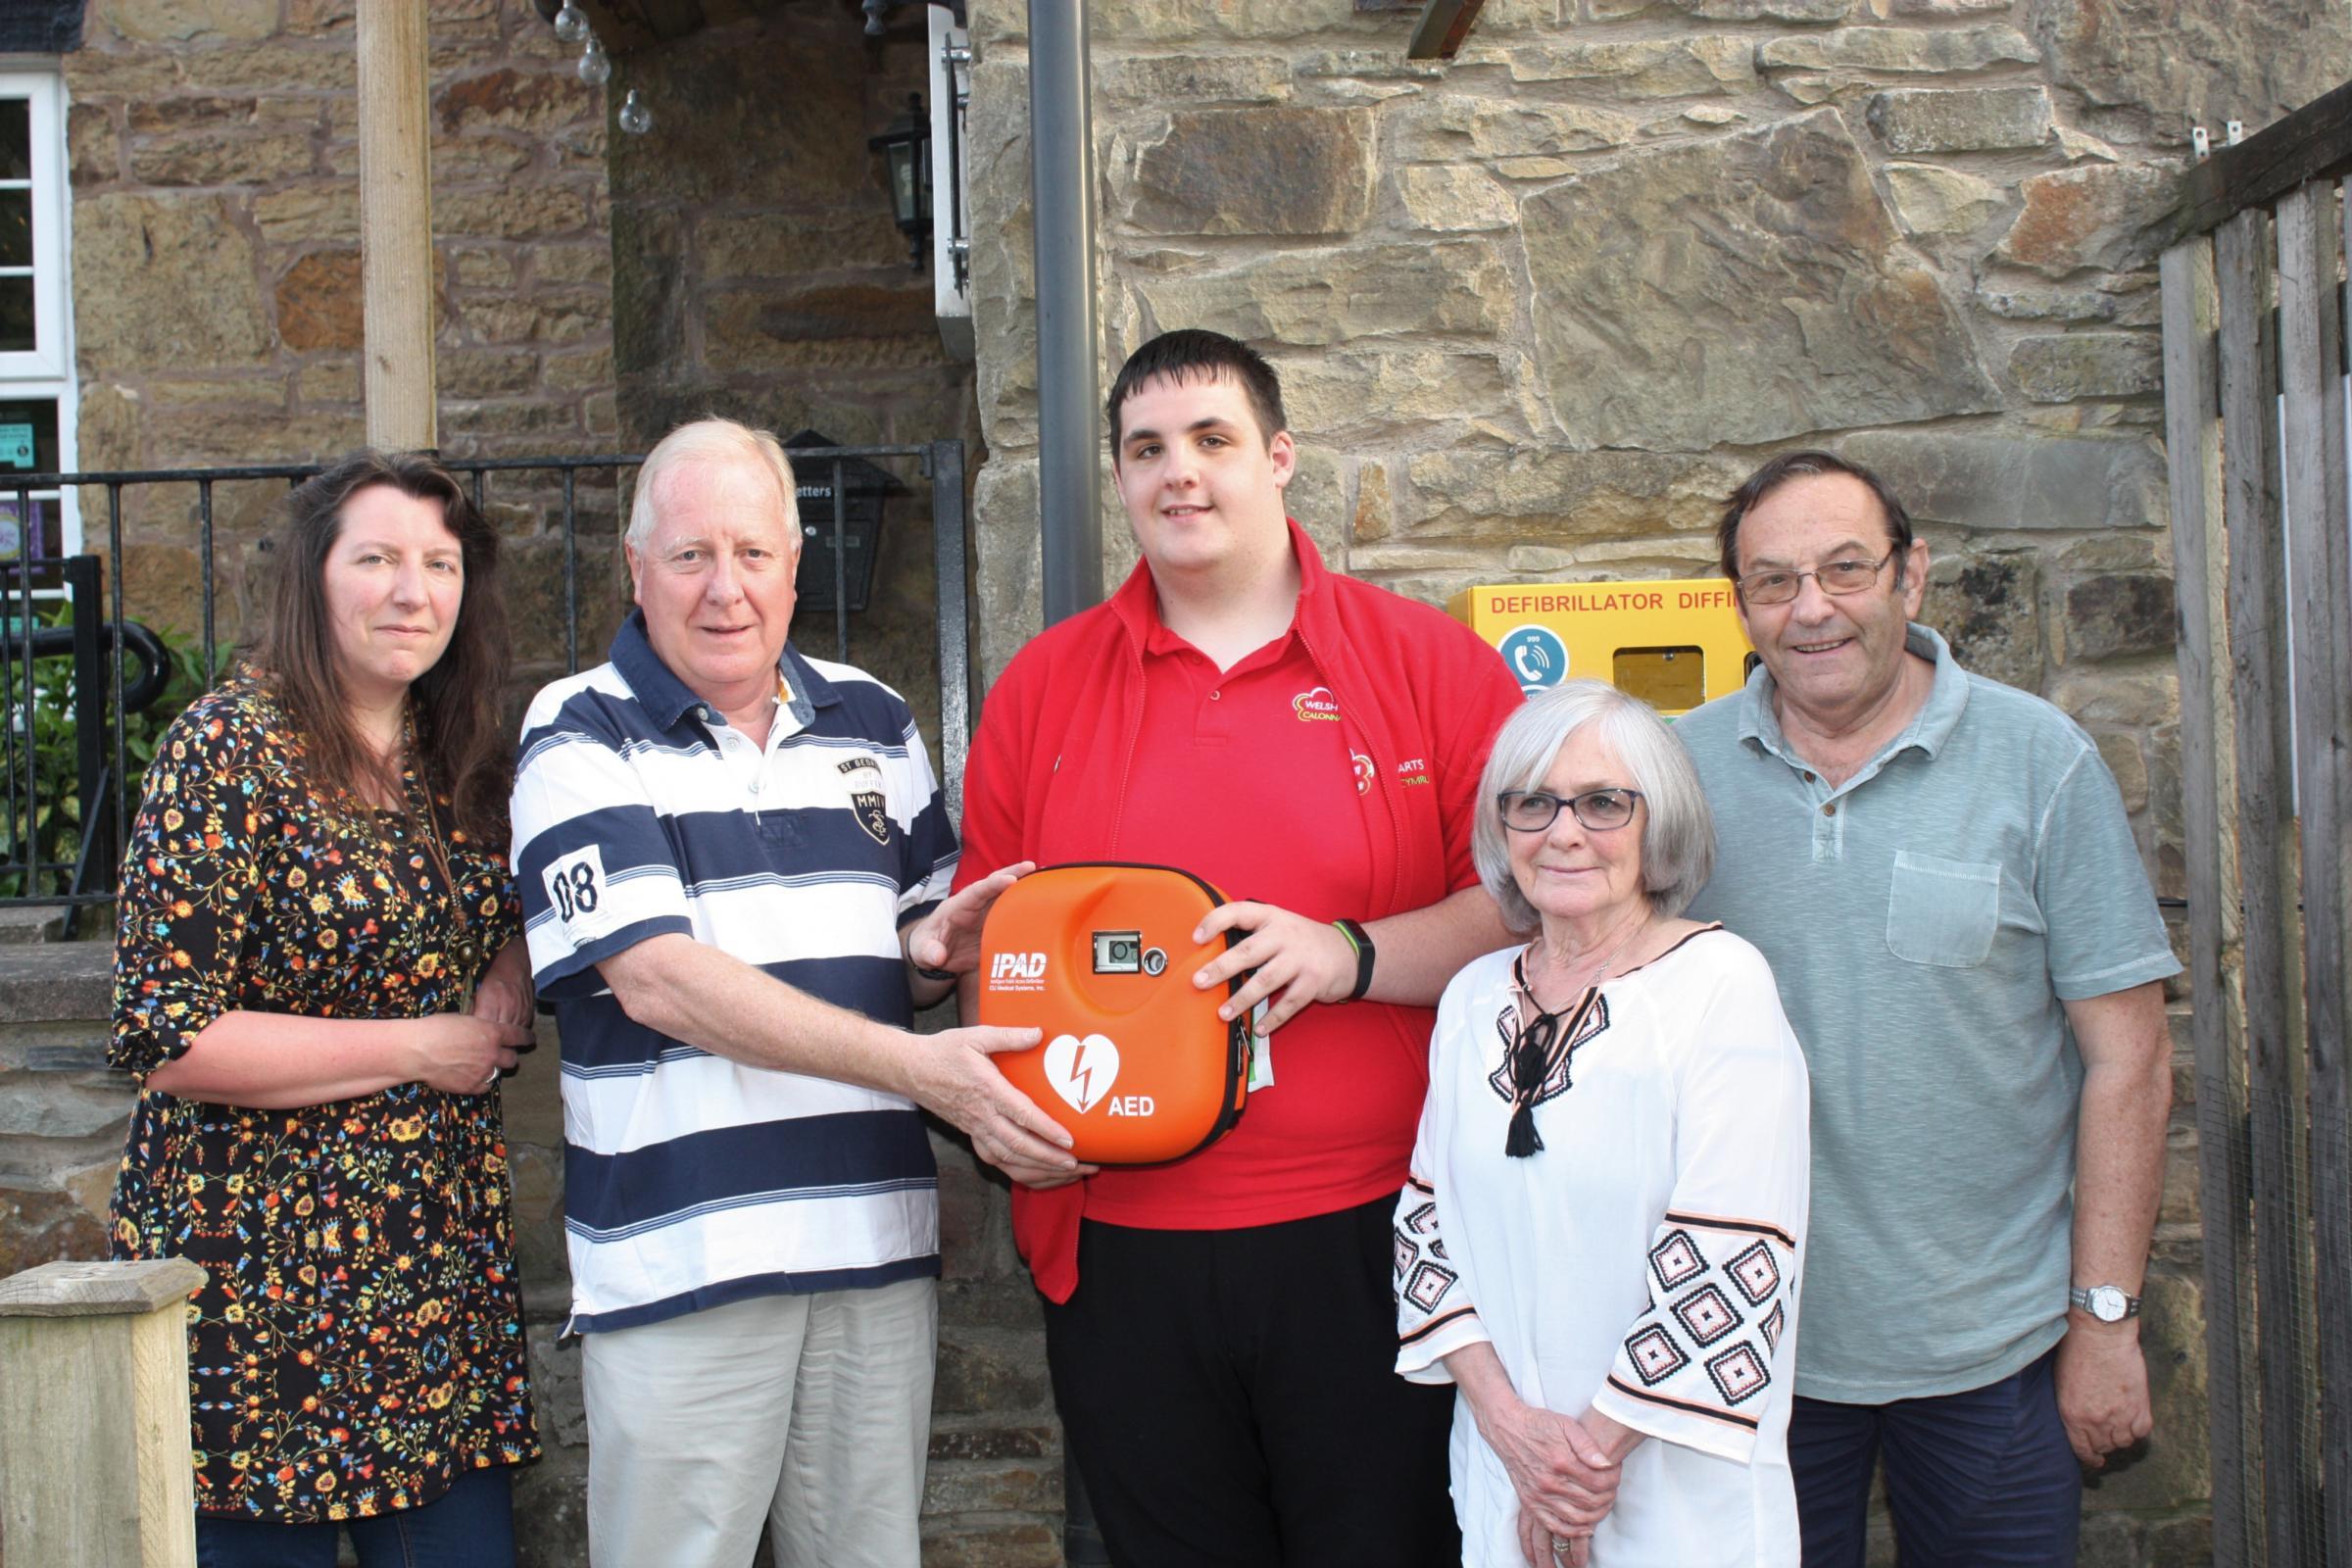 Flintshire community's second lifesaving device unveiled